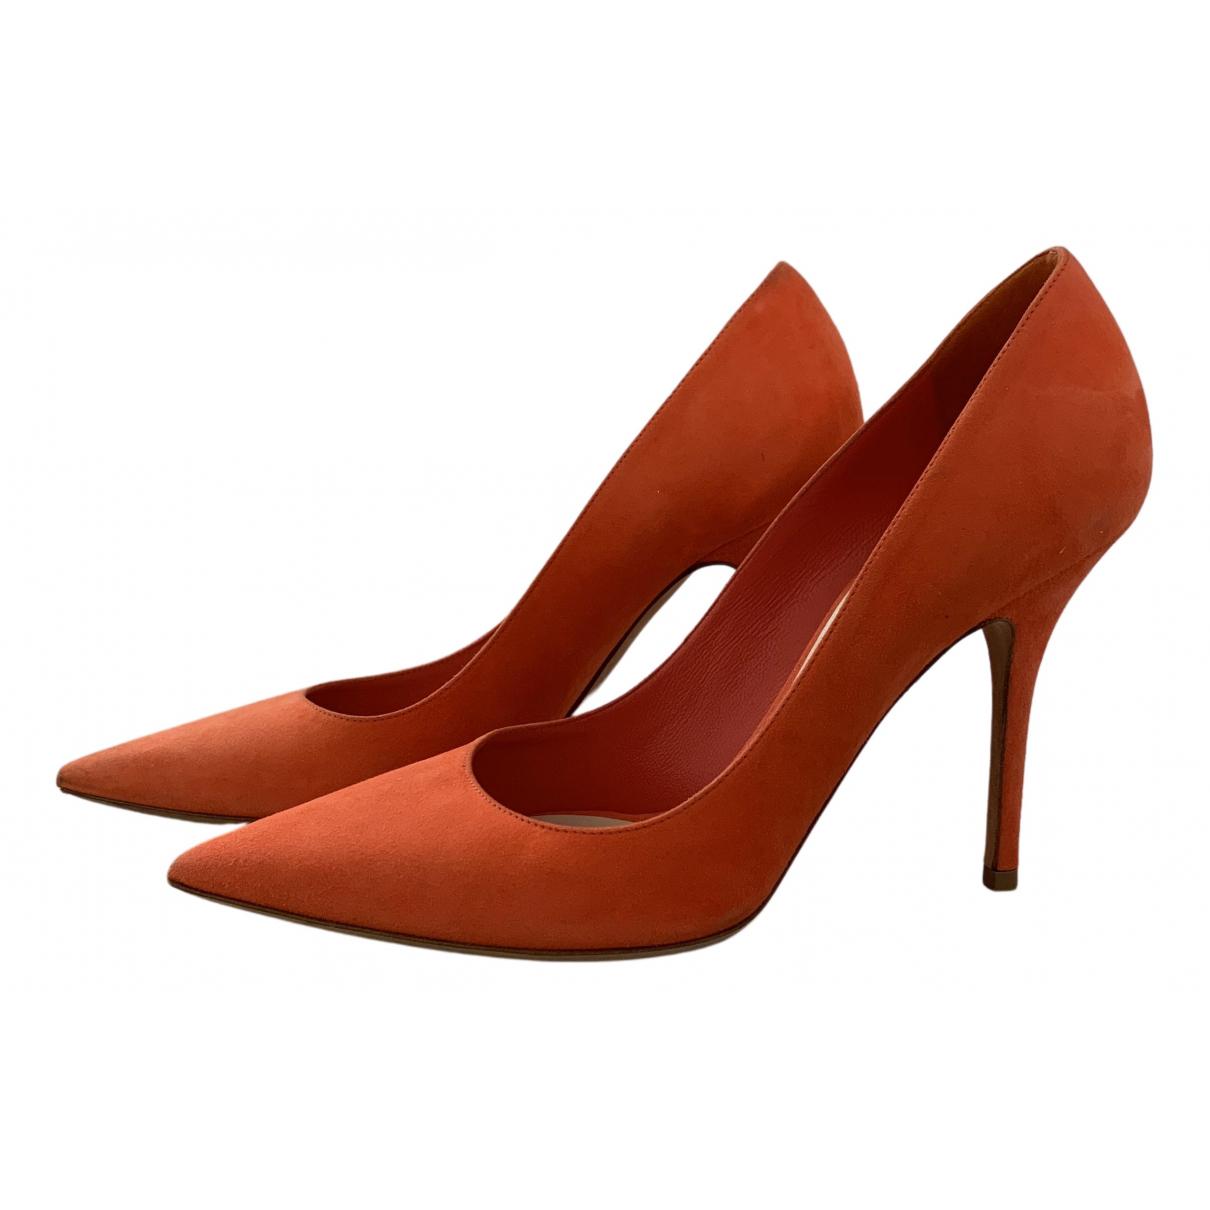 Dior N Orange Suede Heels for Women 38.5 EU